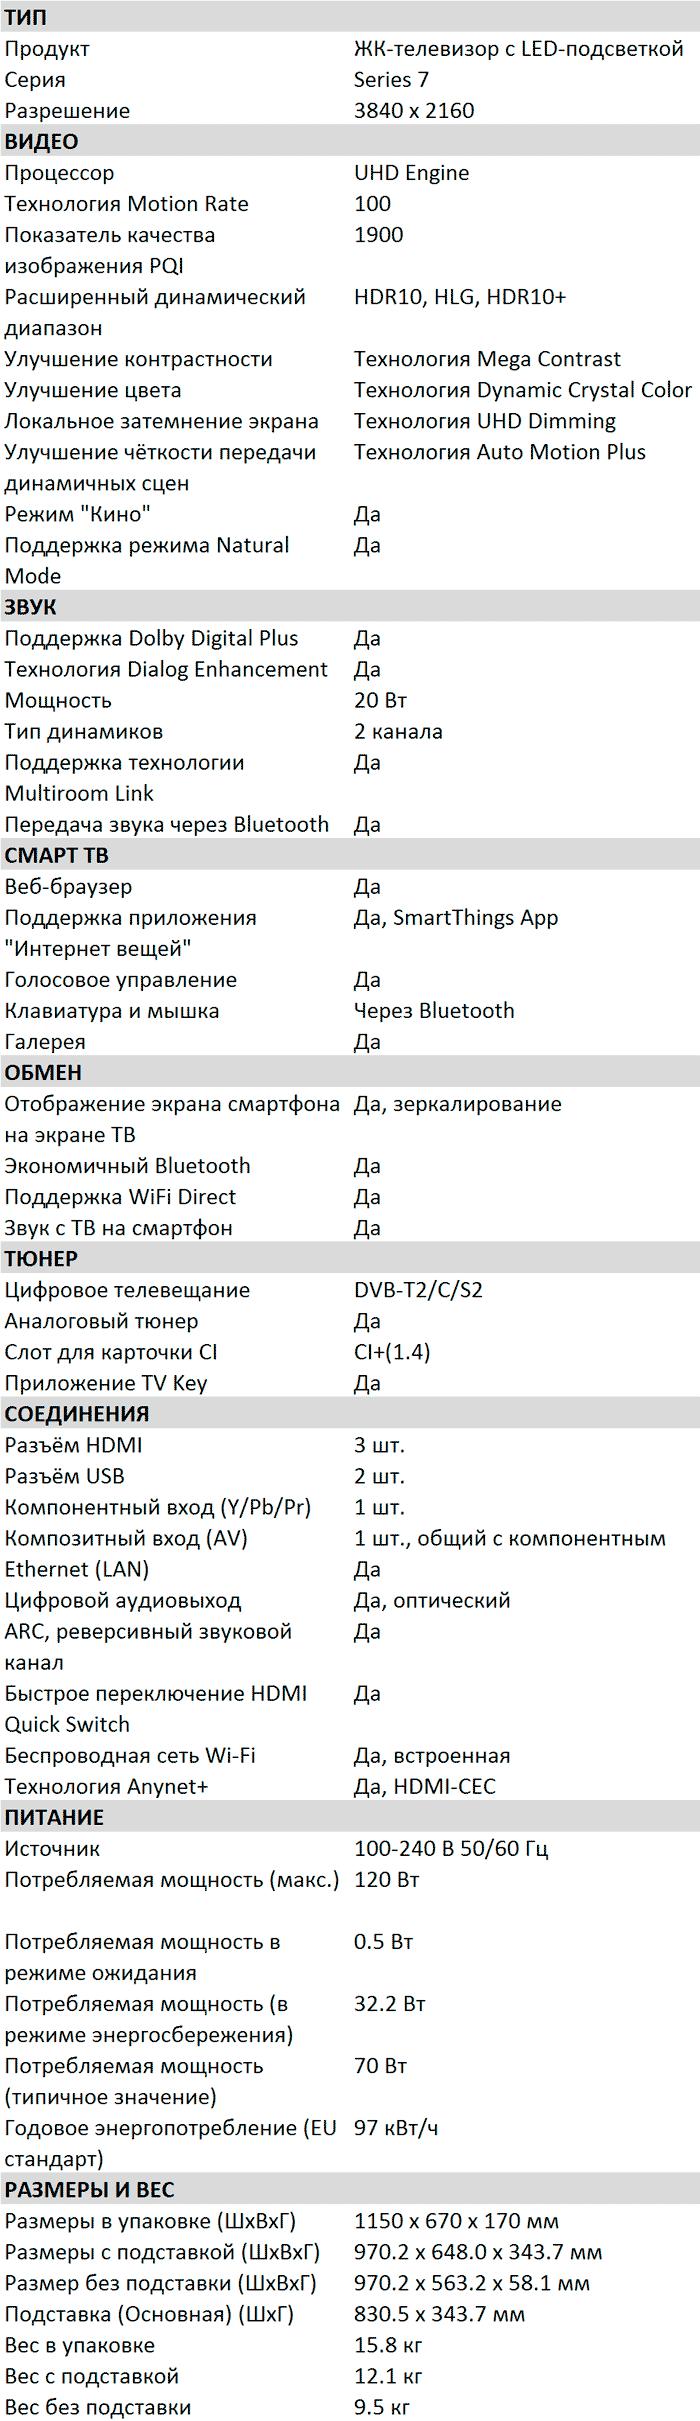 Характеристики RU7400